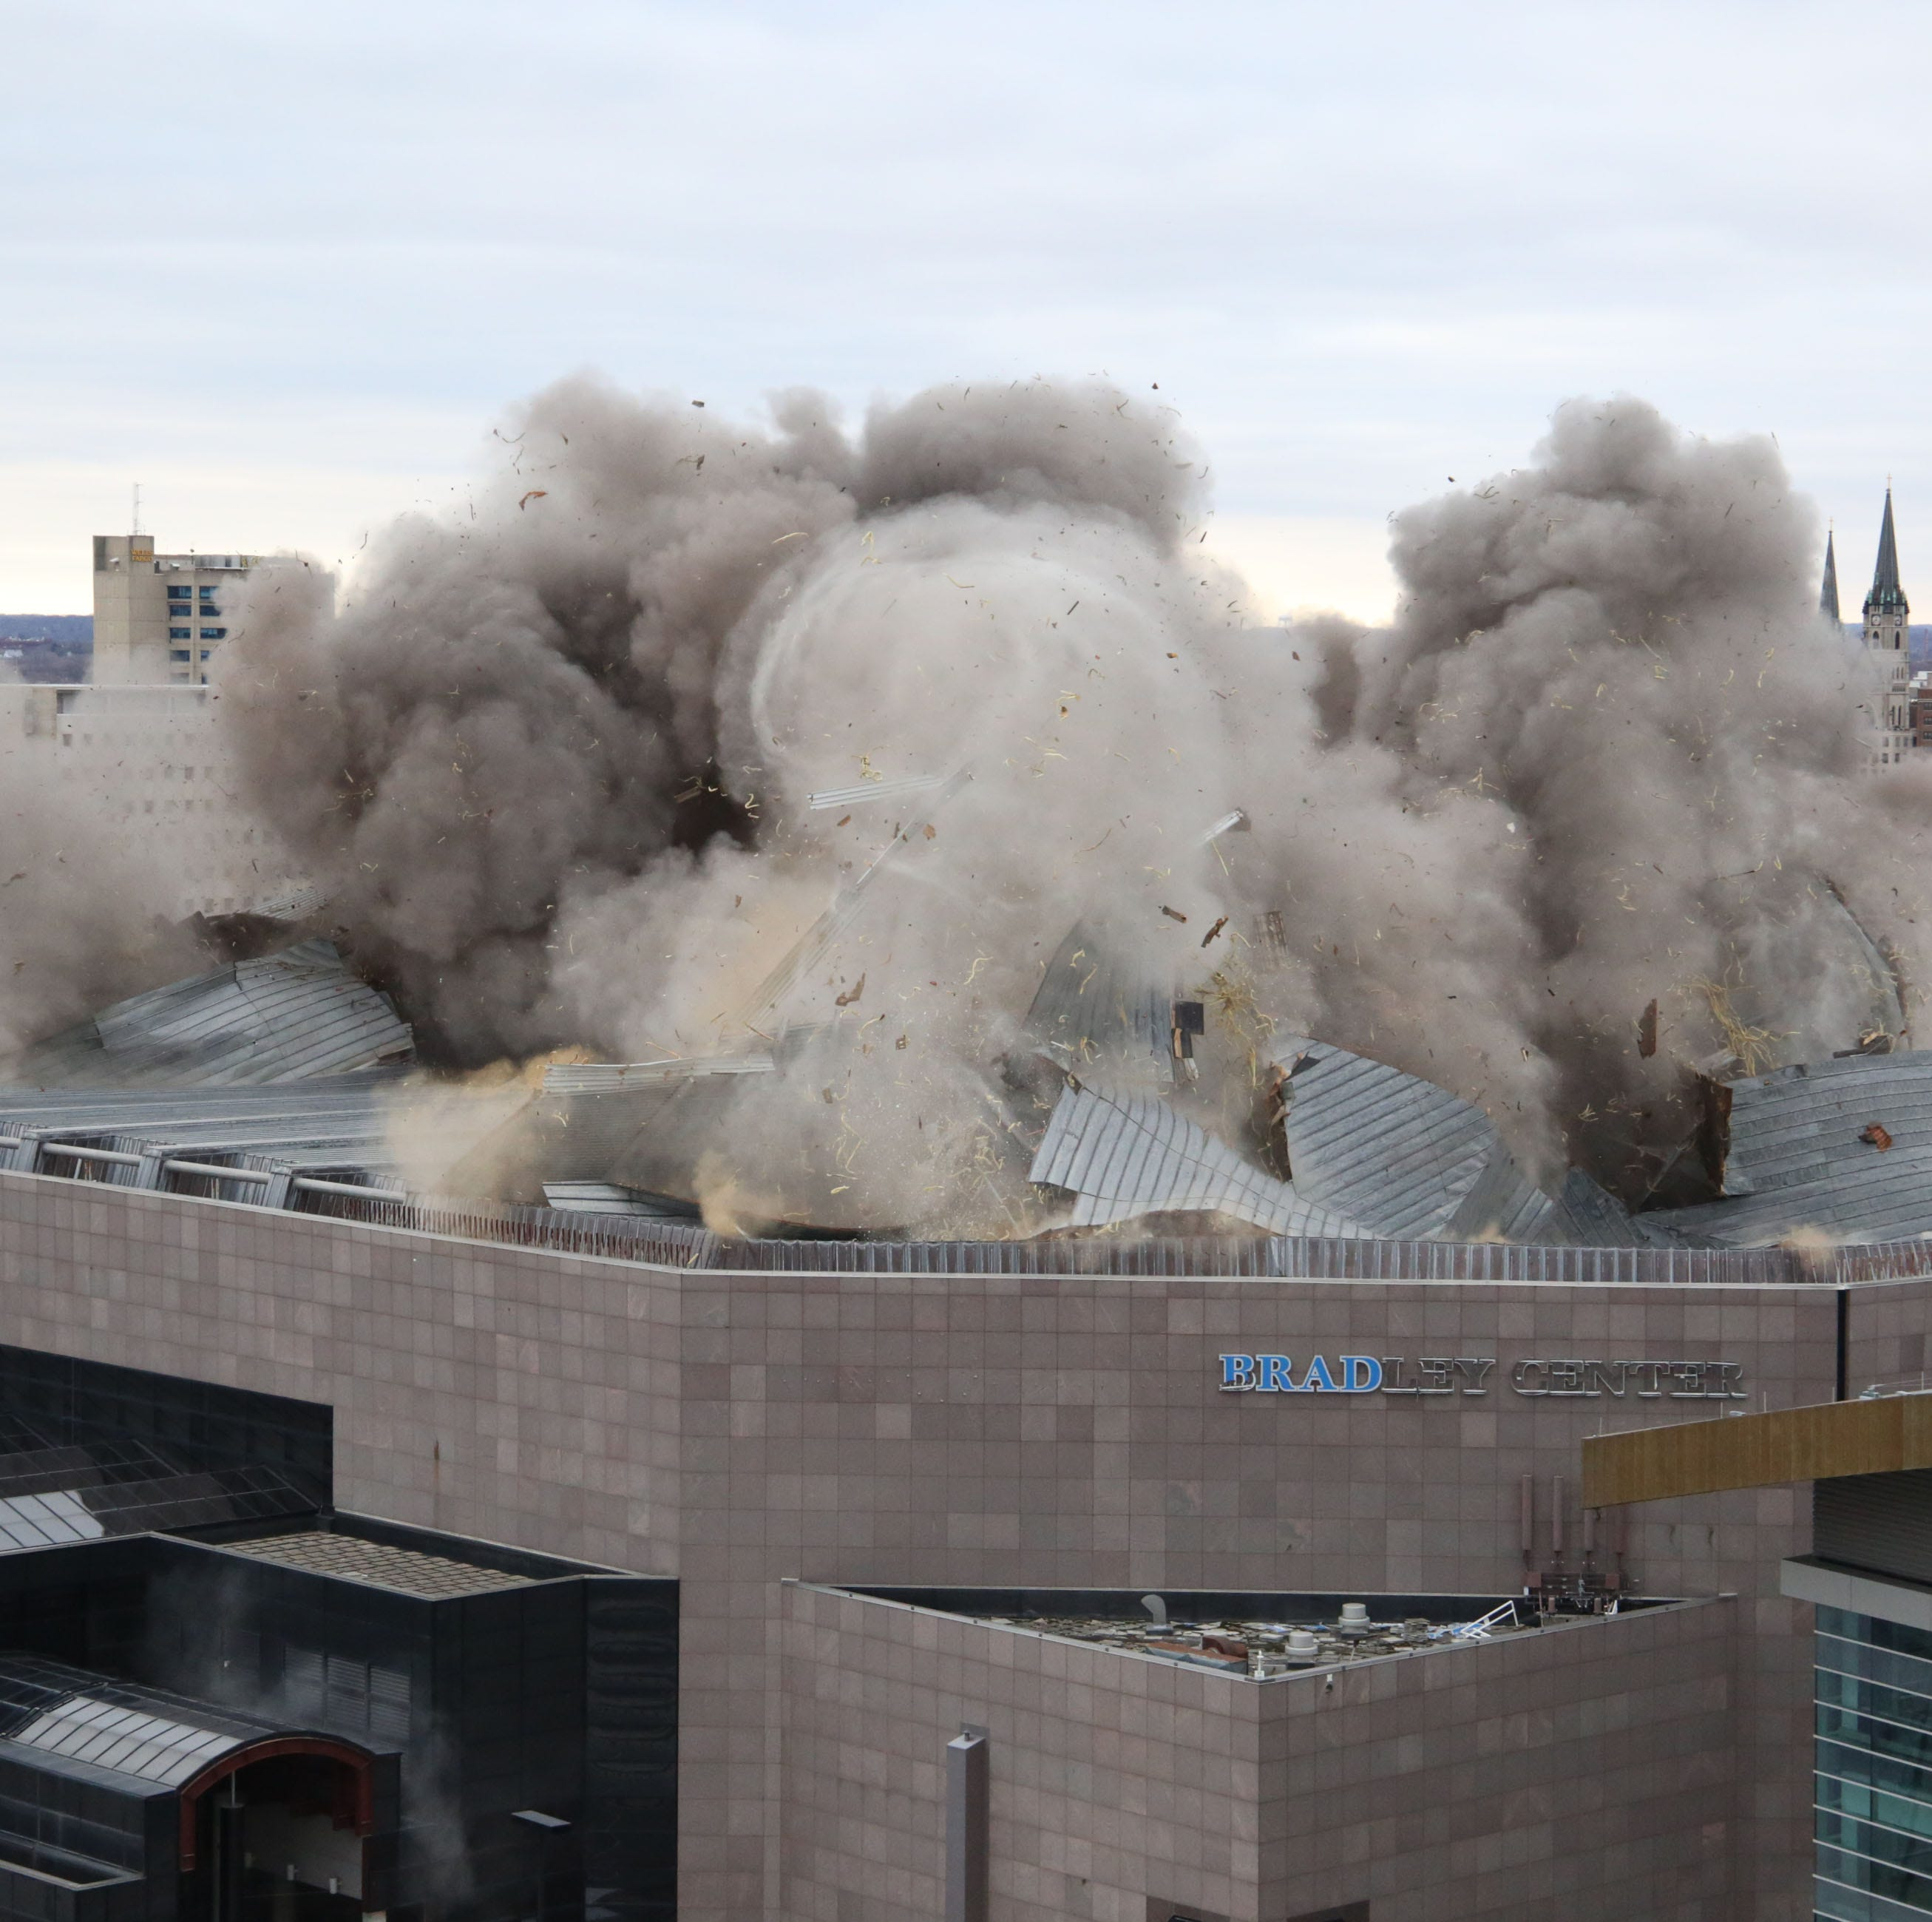 Spectacular blast collapses roof of Bradley Center on Sunday morning